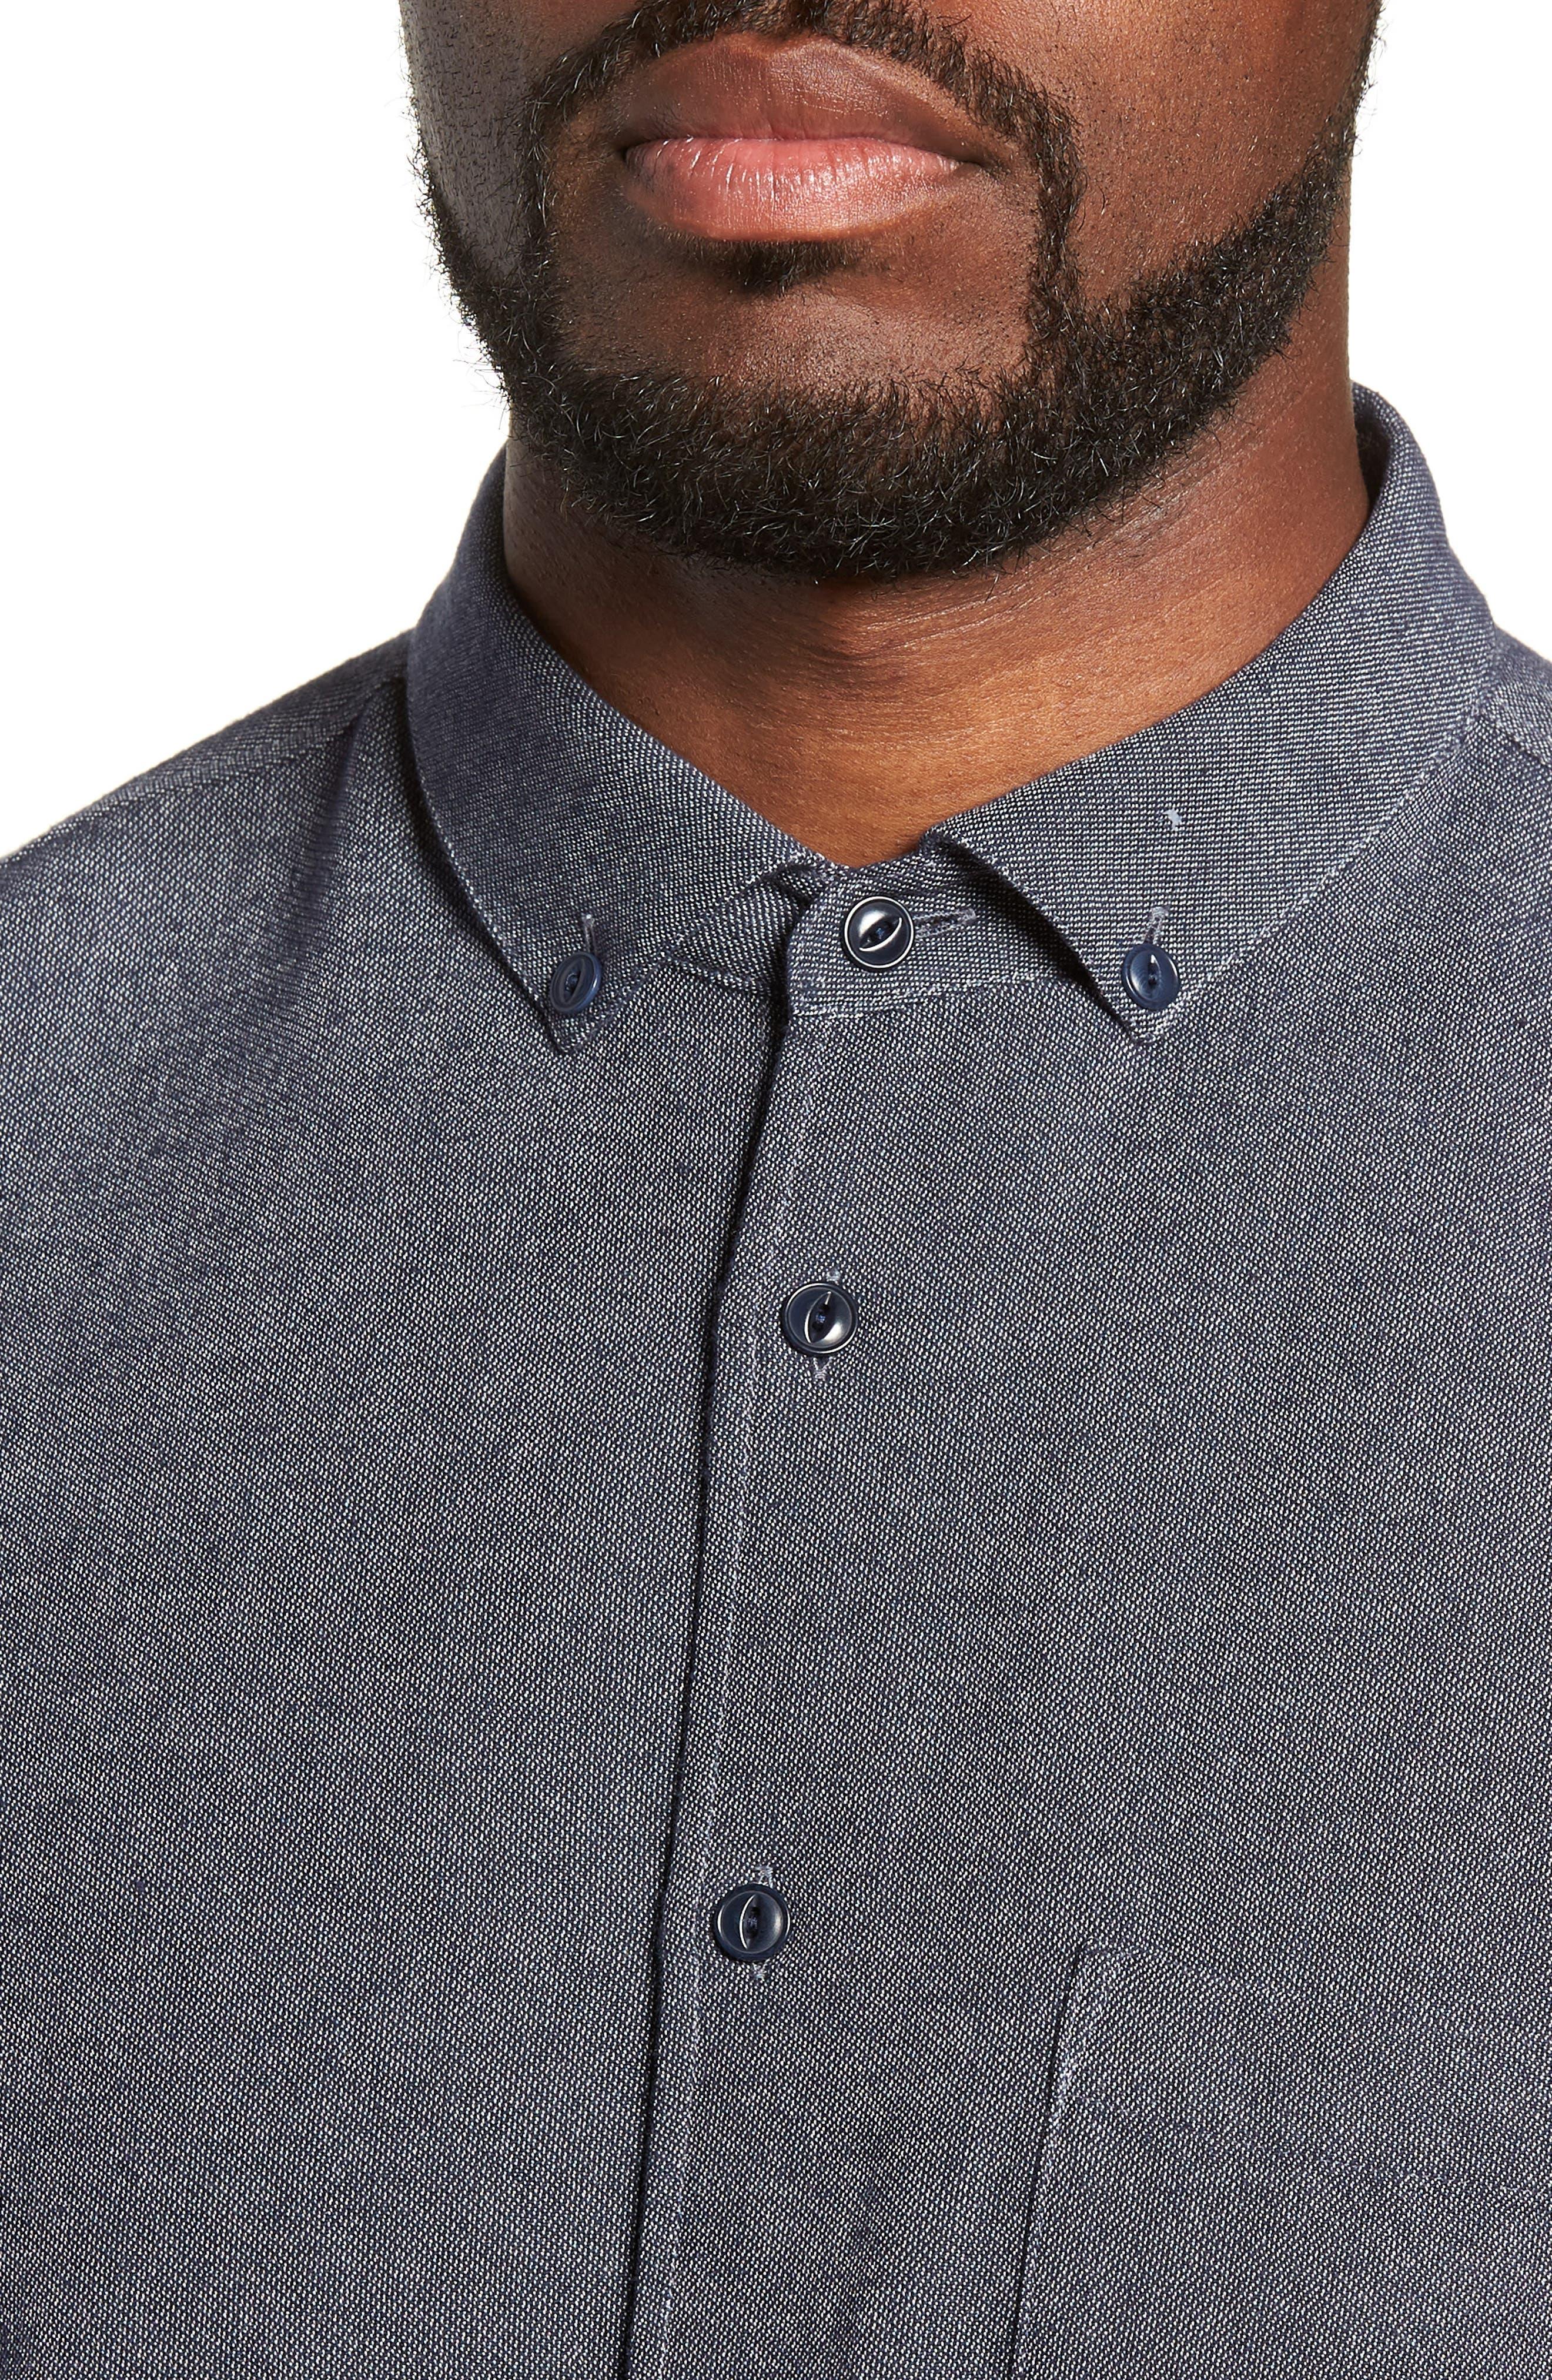 Dean Regular Fit Chambray Shirt,                             Alternate thumbnail 2, color,                             NAVY